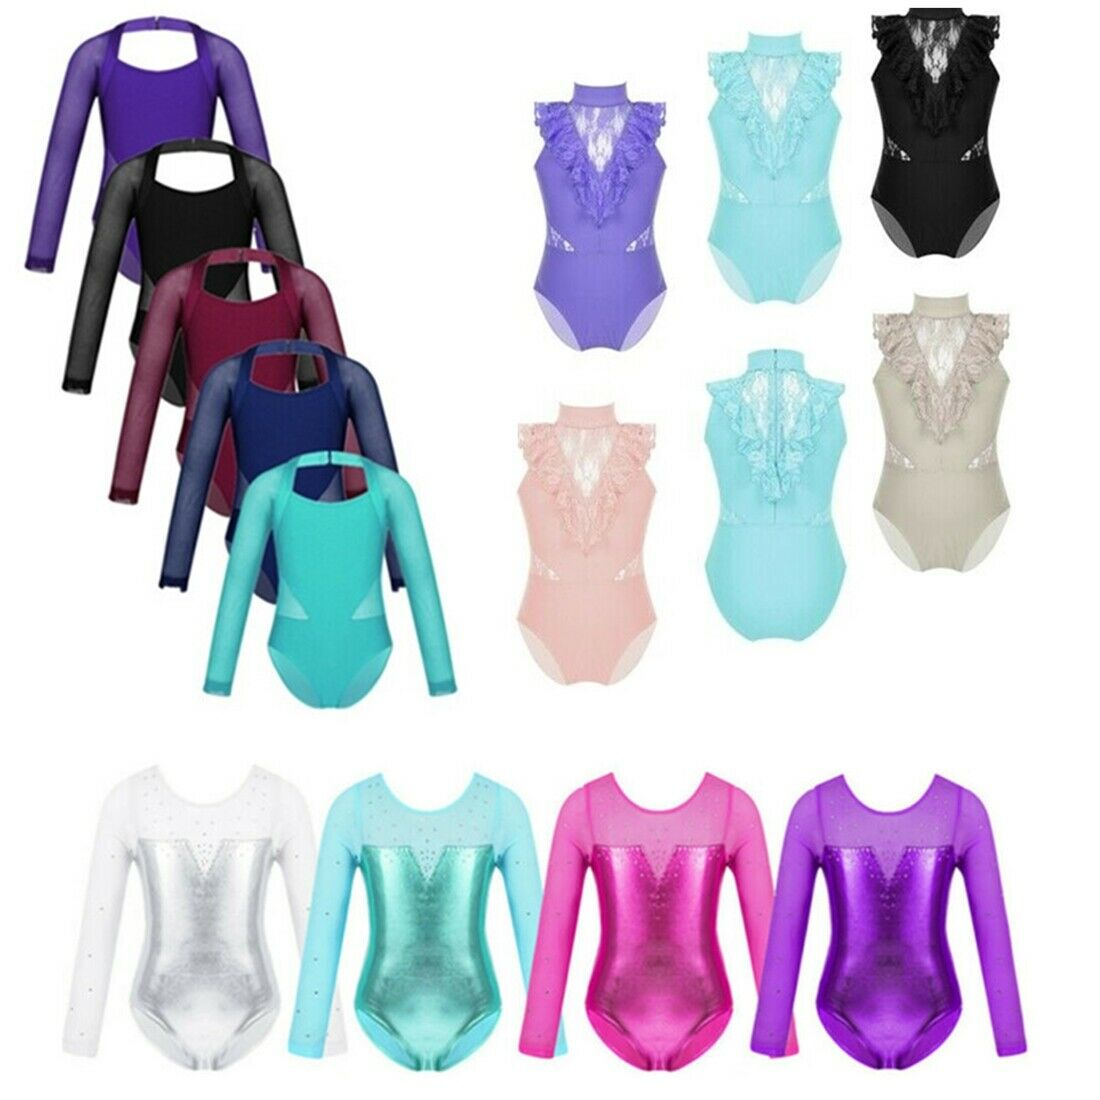 Kid Girls Halter Ballet Leotard Metallic Shiny Bodysuit Sports Jumpsuits Unitard